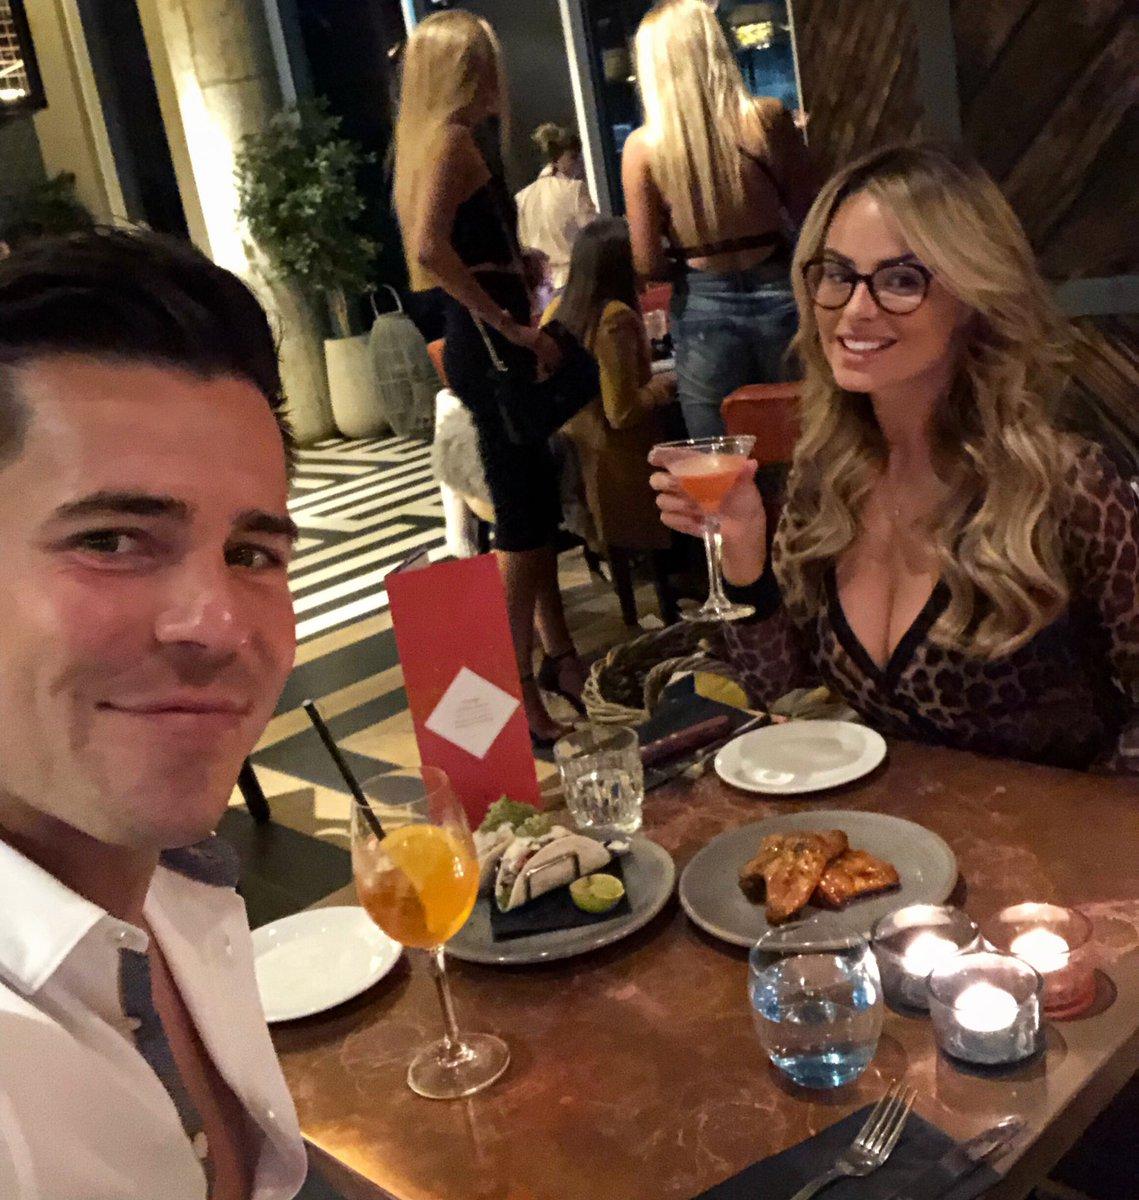 Date night last night @refinery_mcr @olivermellor ???????? #Manchester #outout ❤️ https://t.co/sFWLRqpkGx